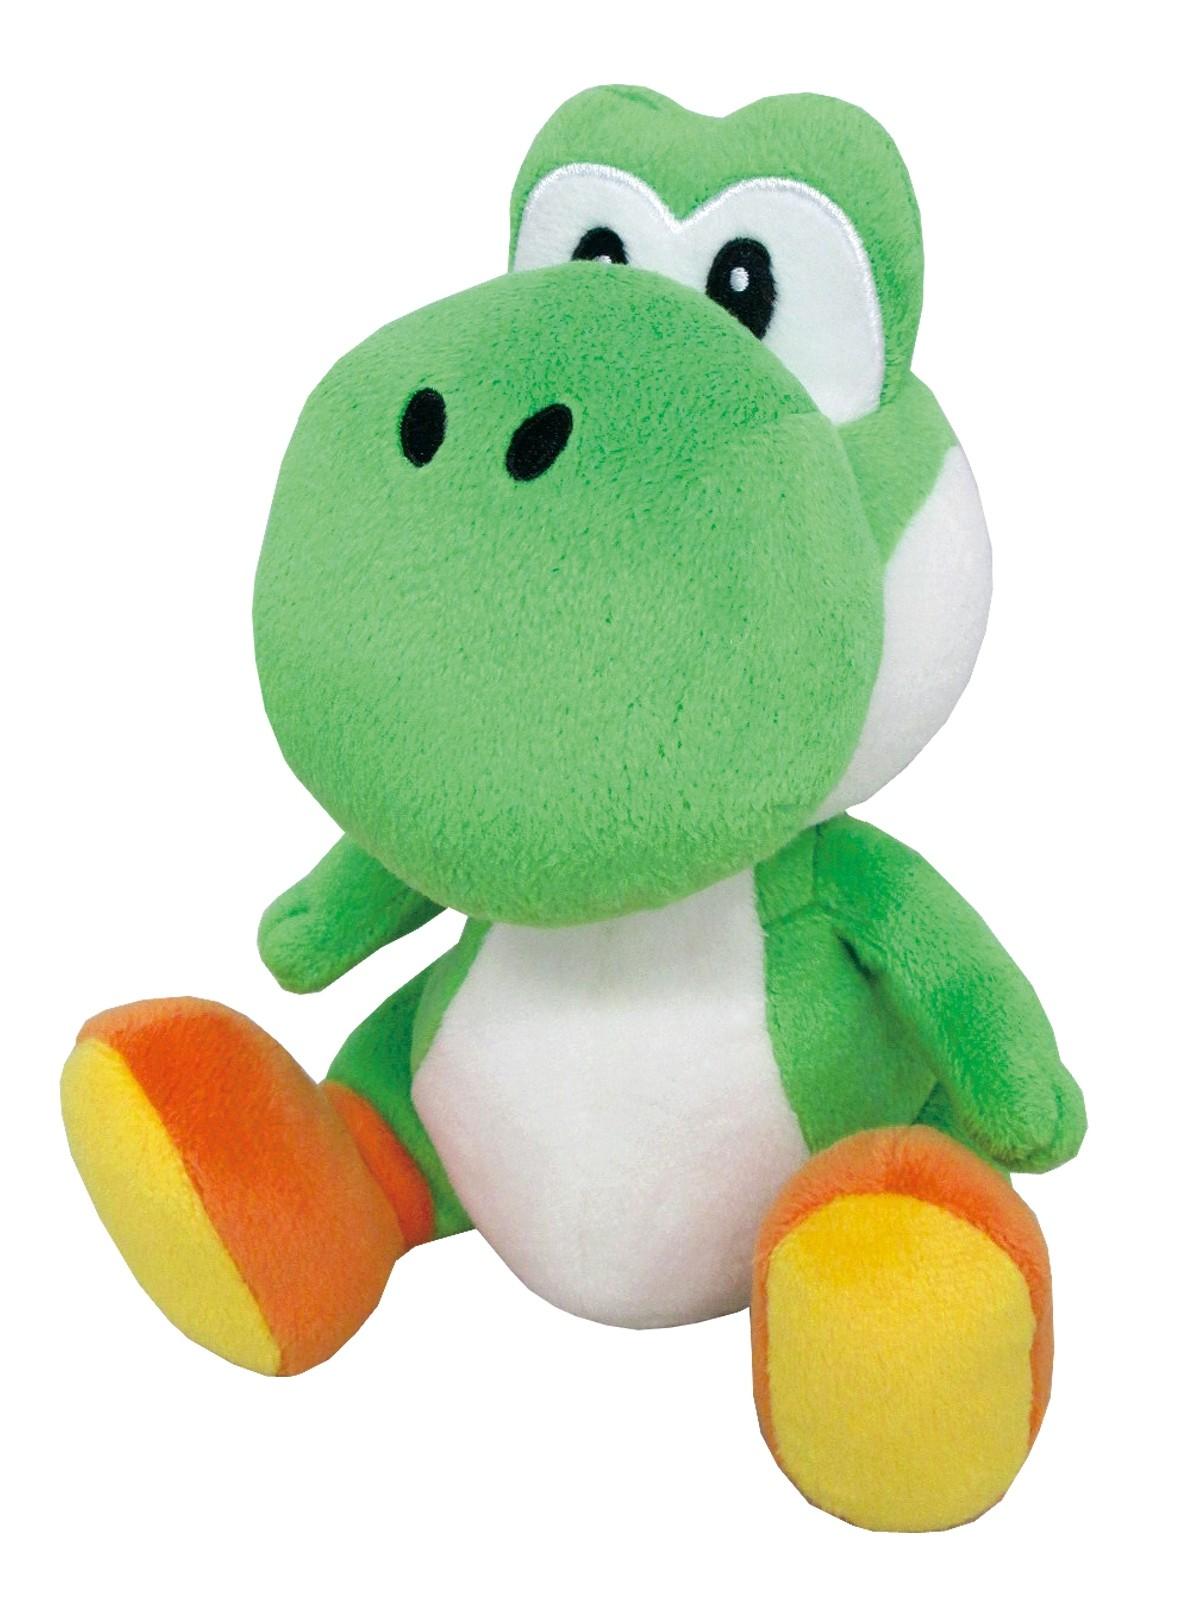 Green Yoshi 8 Inch Plush